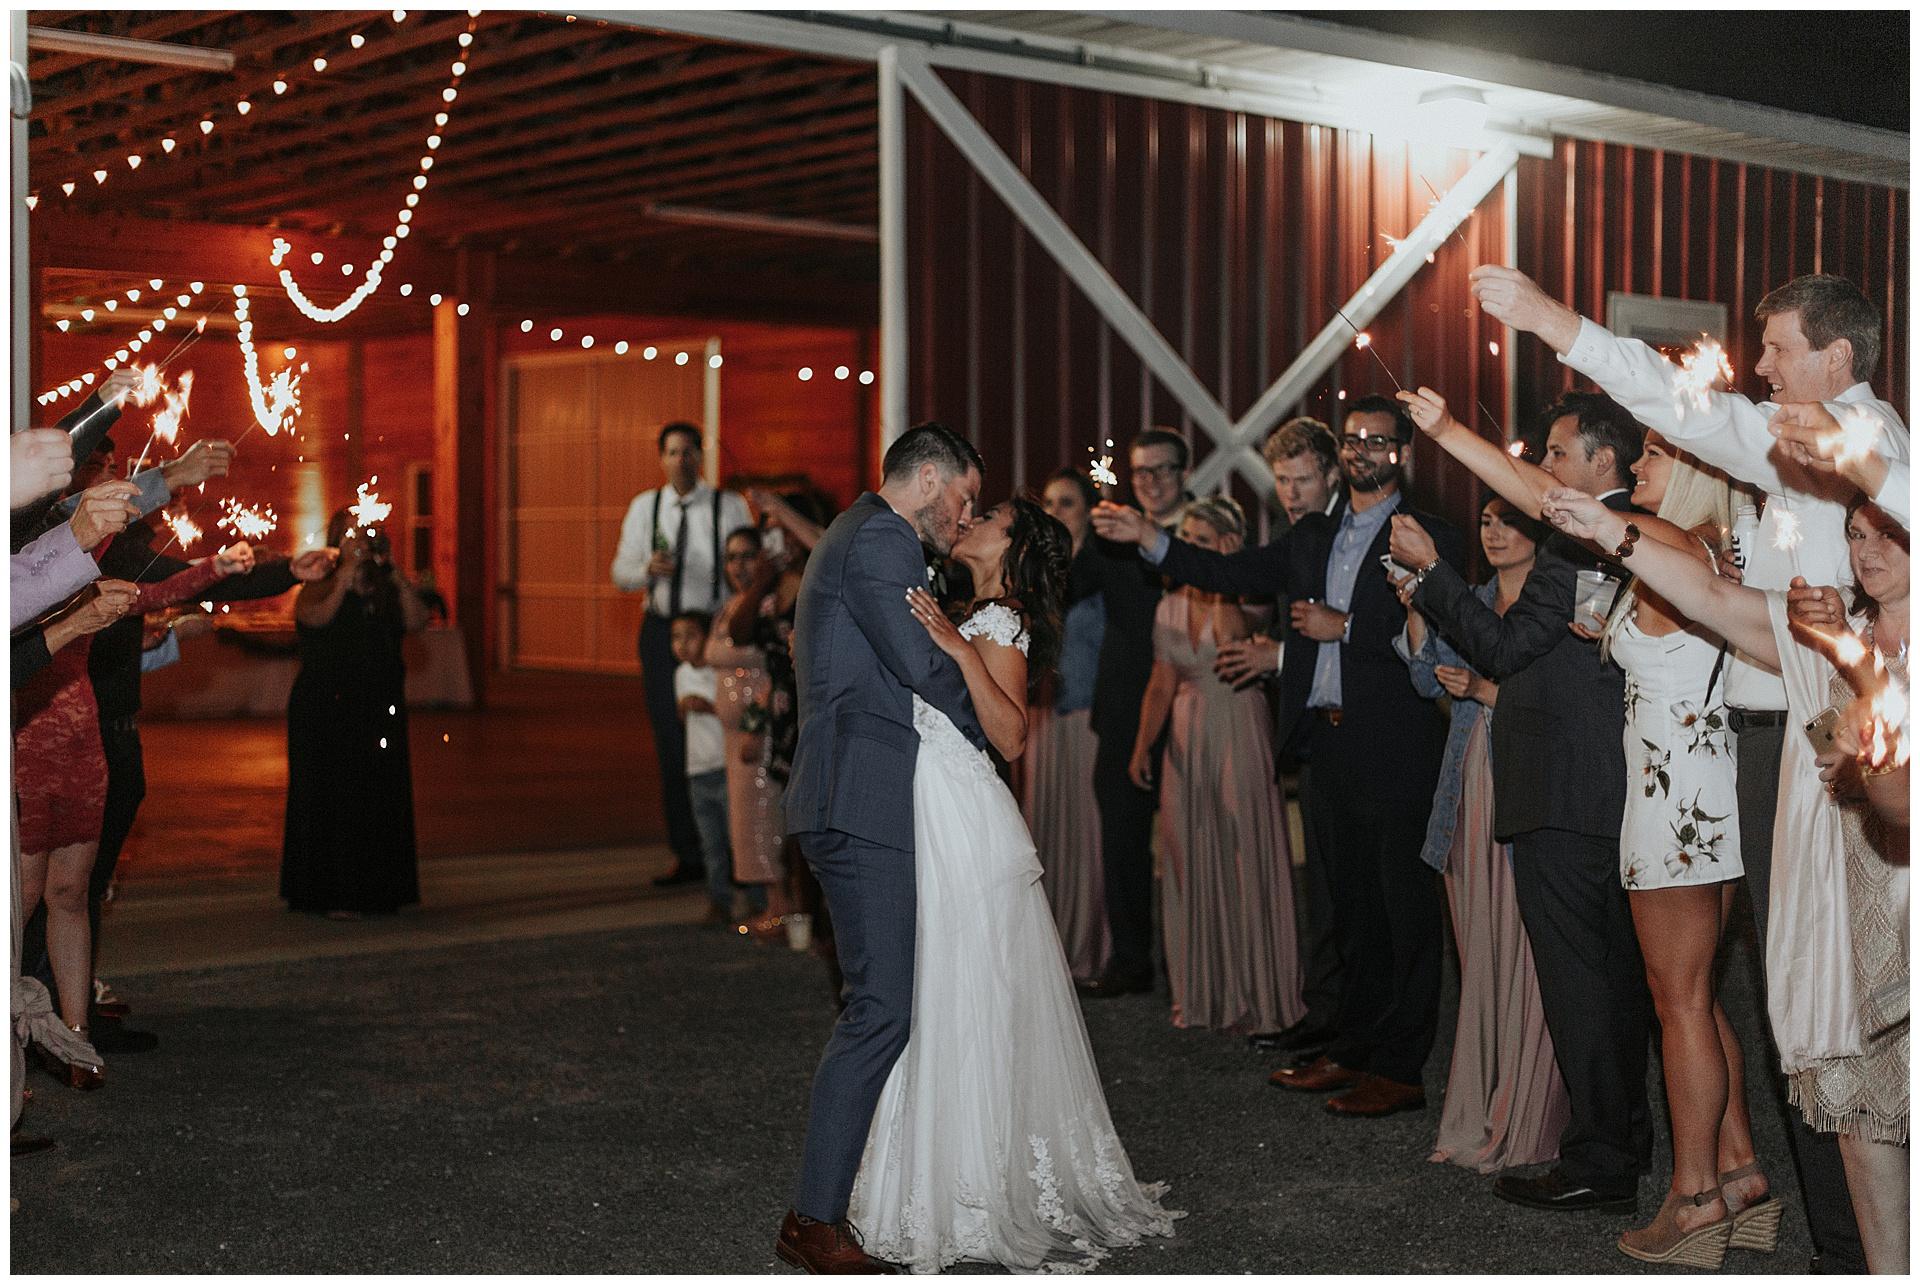 st augustine wedding photographer_mia dimare photography54.jpg